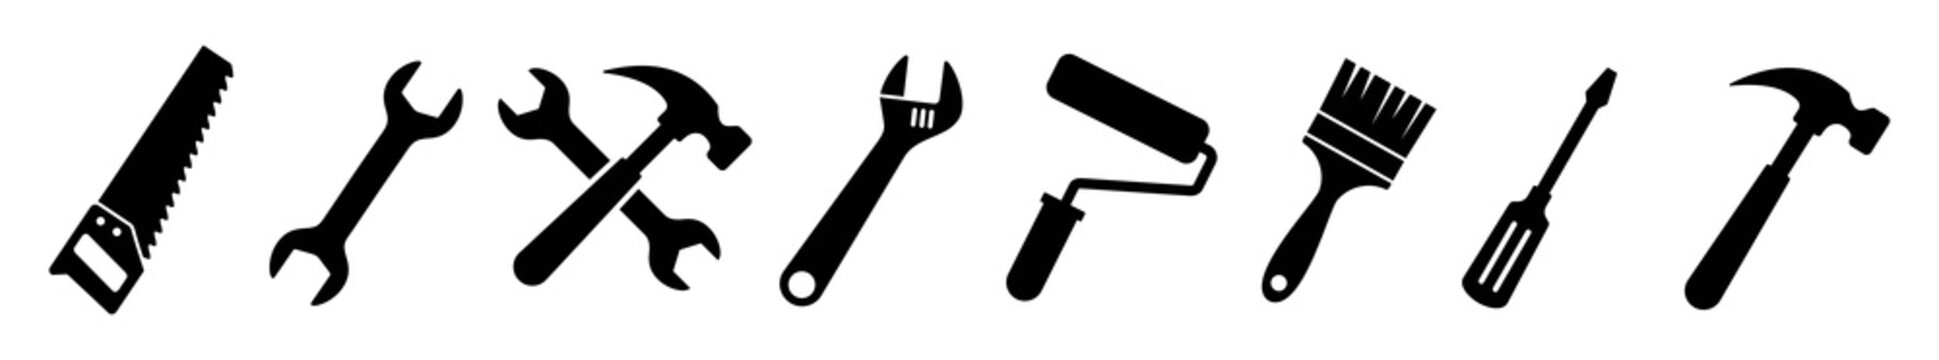 Tool icon set. Instrument symbol, wrench, hammer, handsaw, paint brush, screwdriver, adjustment wrench, Vector illustration